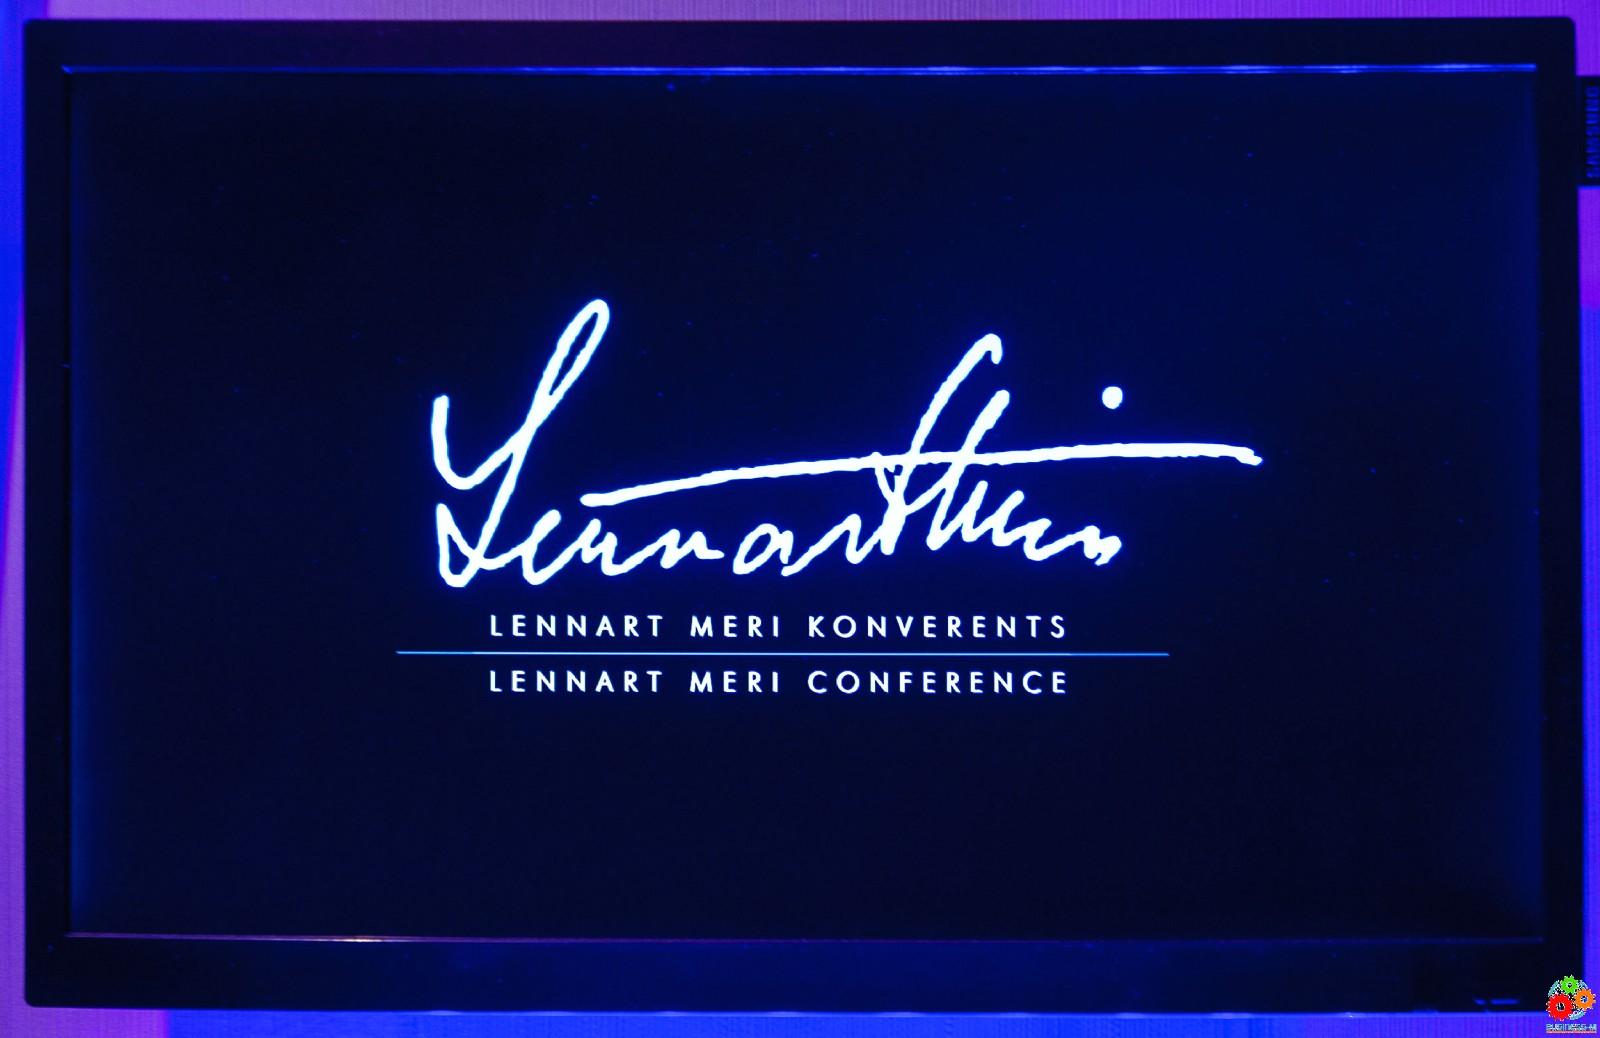 В Таллинне прошла Конференция Леннарта Мери